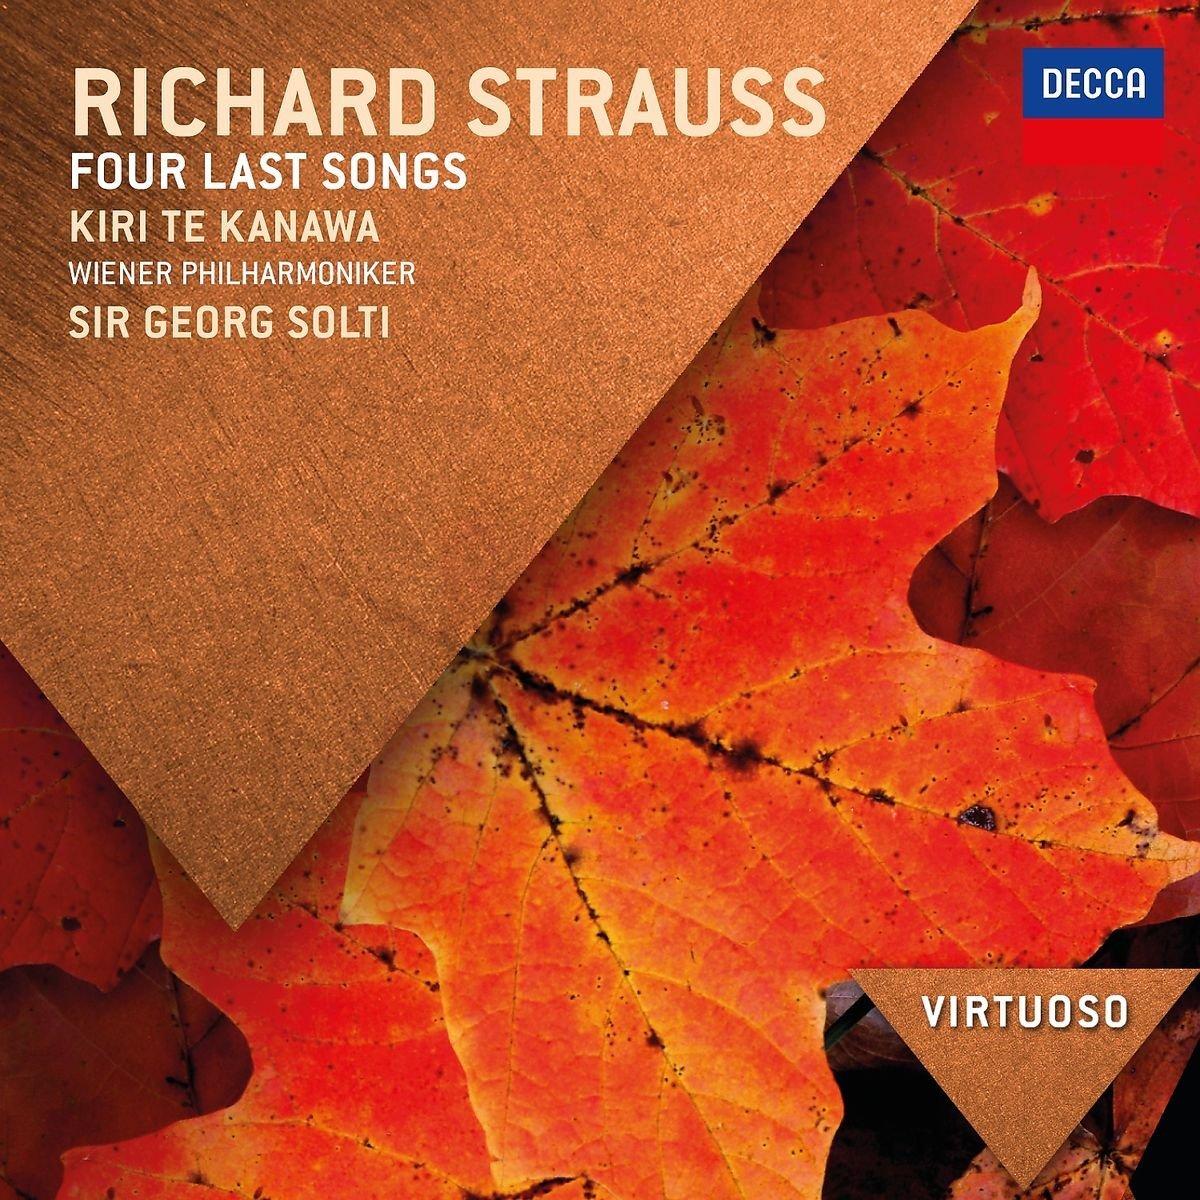 Sir Georg Solti. Richard Strauss. Four Last Songs